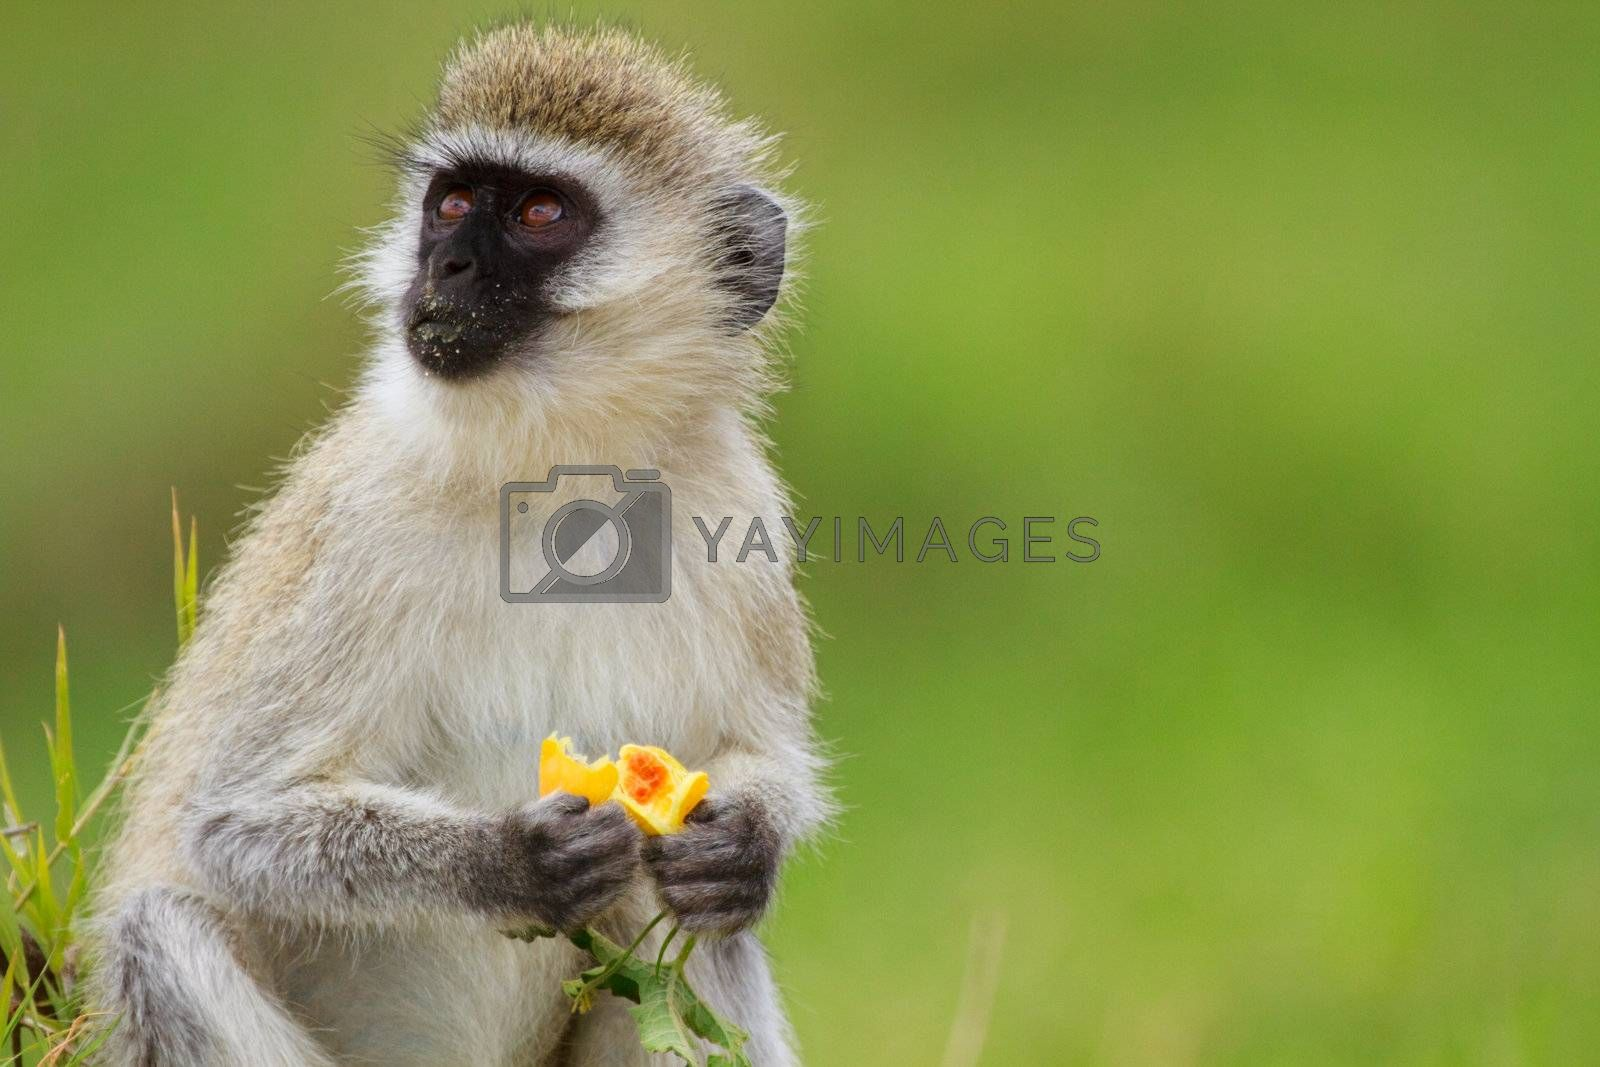 Black-faced vervet monkey eating fruit. Serengeti national park, Tanzania